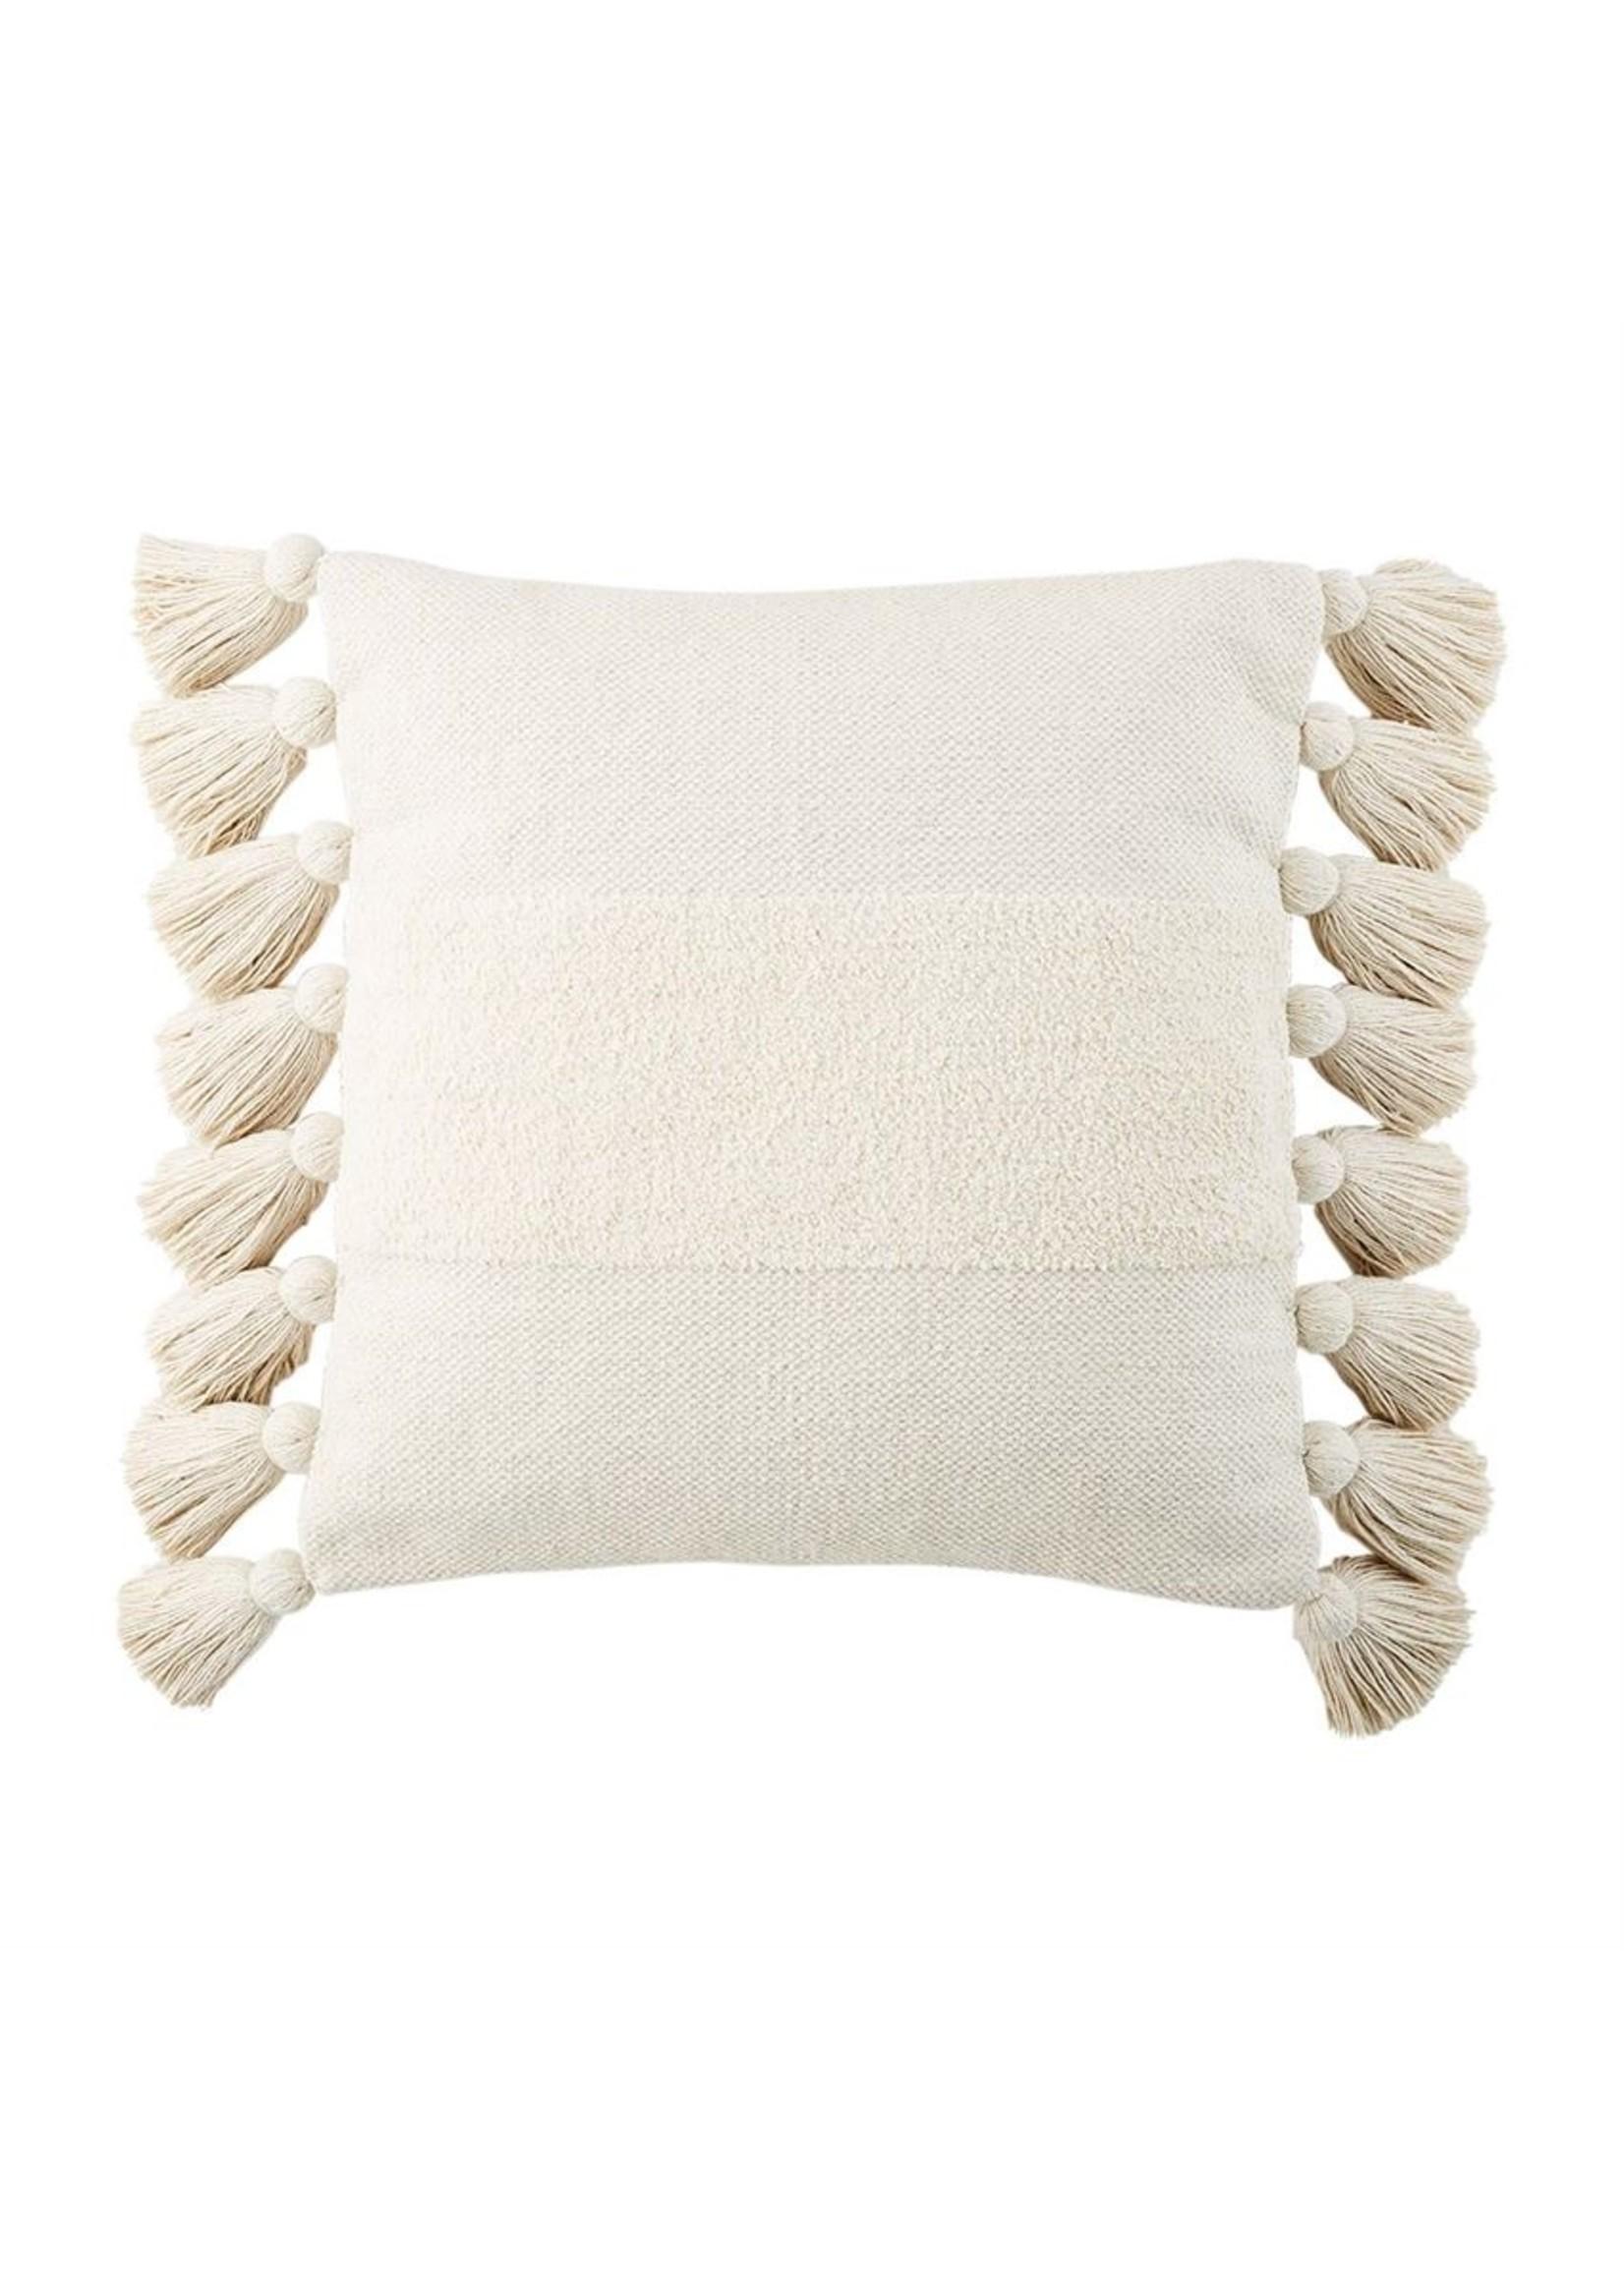 Mudpie Tassel Chenille Pillow